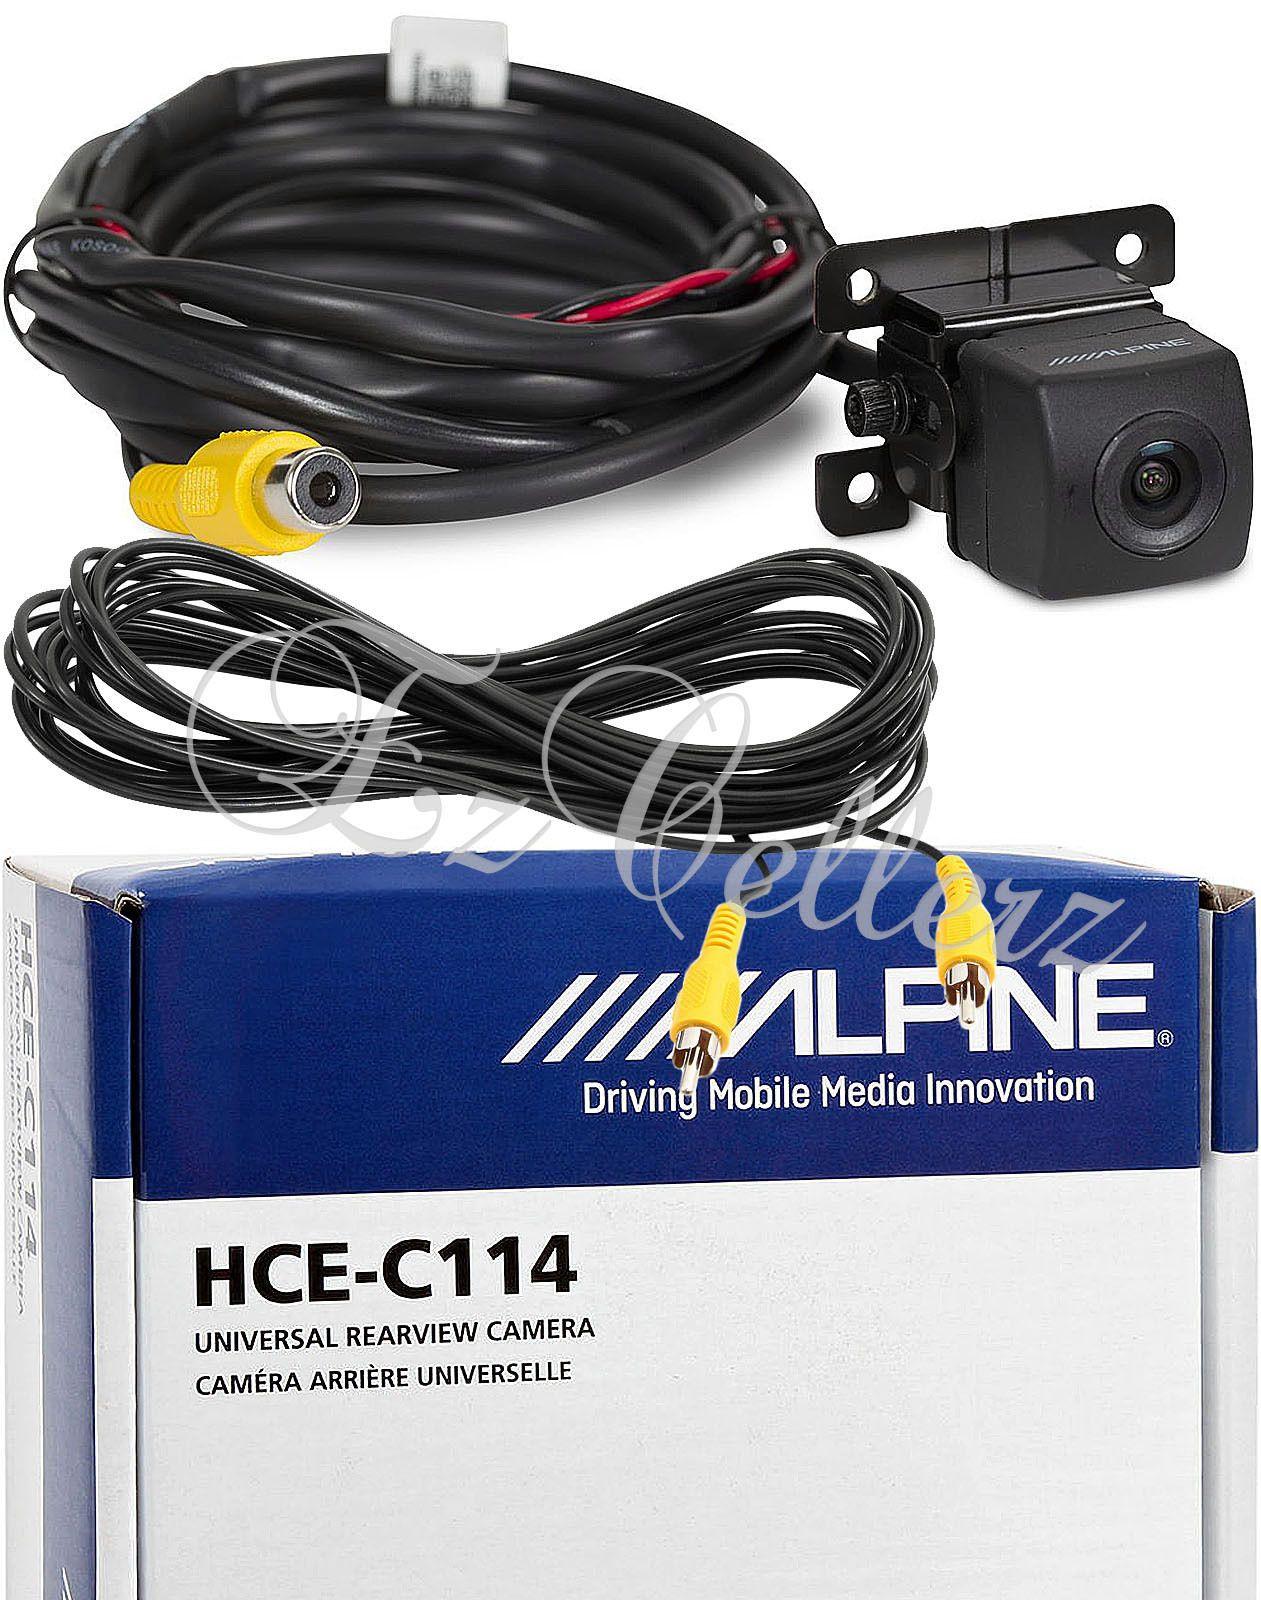 alpine backup camera wiring alpine reverse camera install wire alpine wiring harness pinout other car video alpine hce c114 rear view backup color cmos wide alpine reverse camera wiring